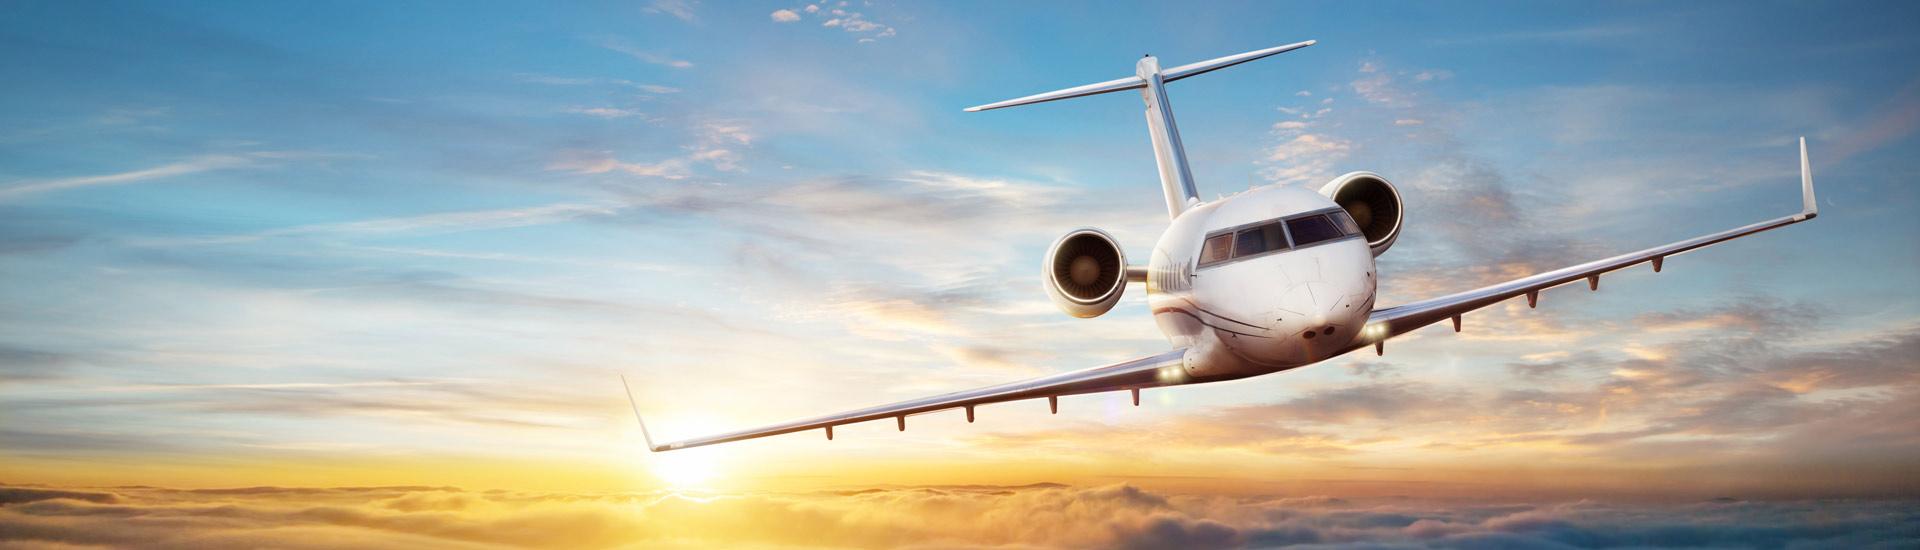 Jet-Aeronáutica-Grupo Interactivo